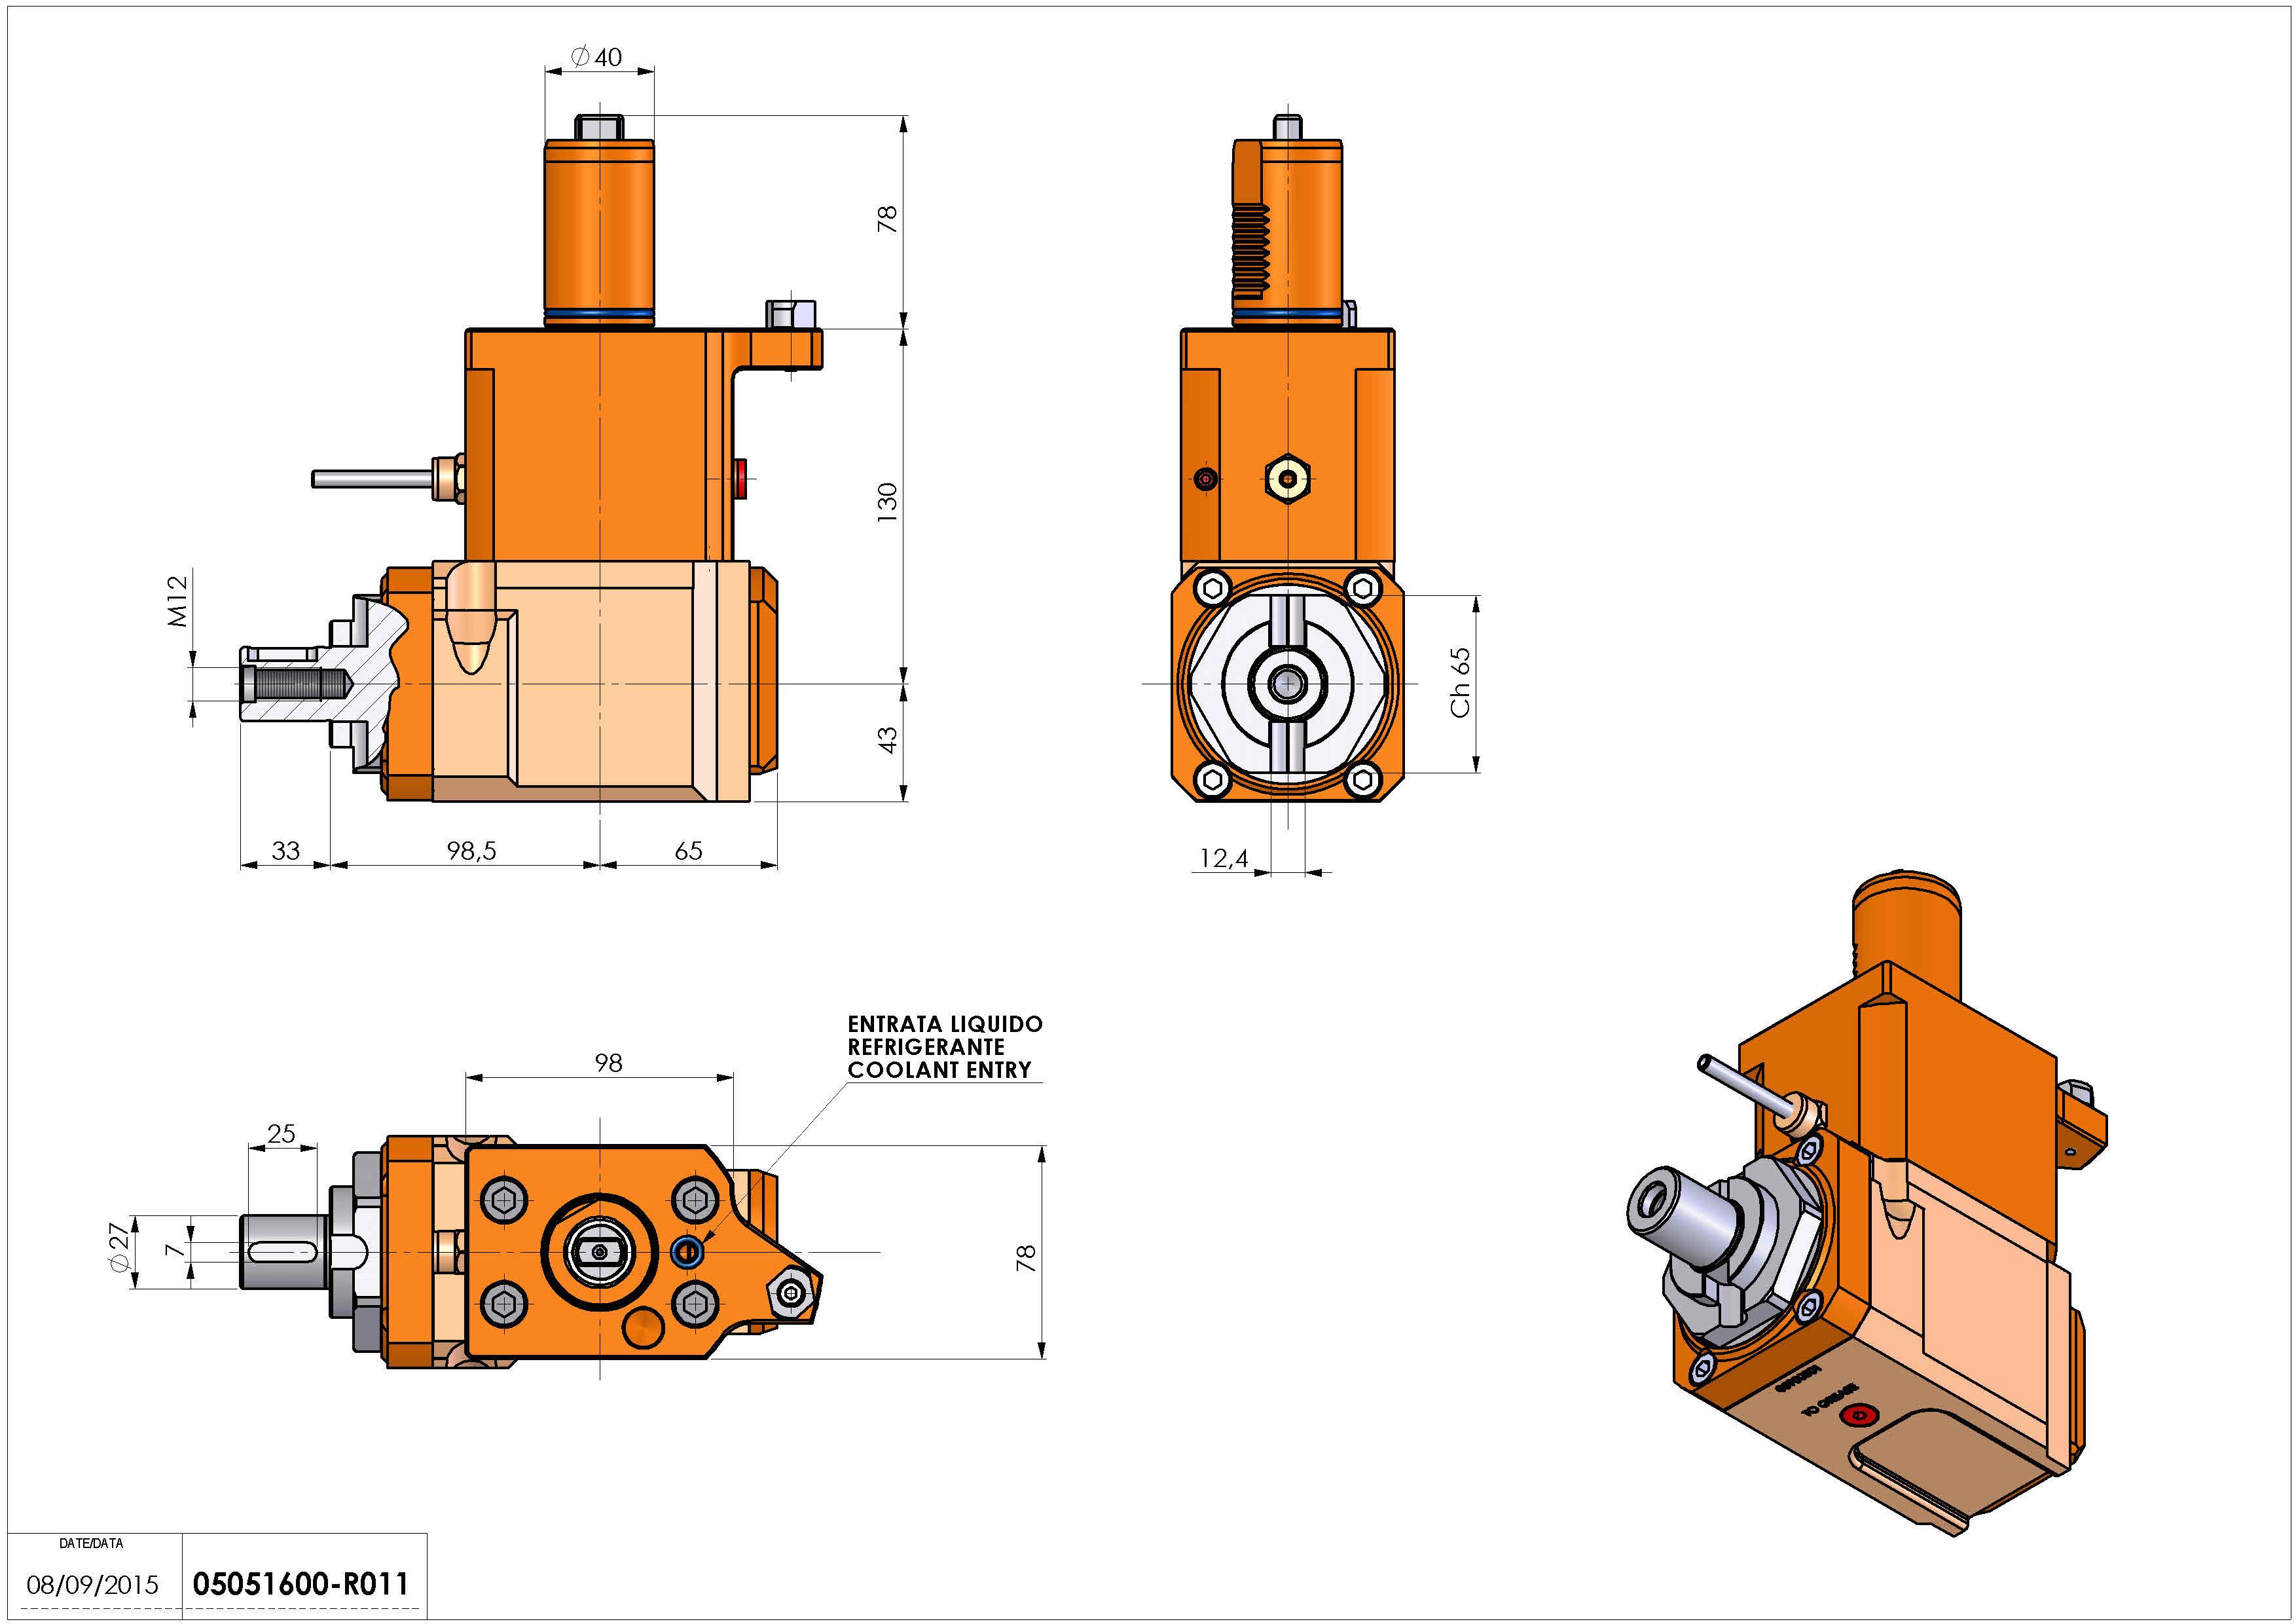 Technical image - LT-A VDI40 DIN138-27 L H130 MZ.